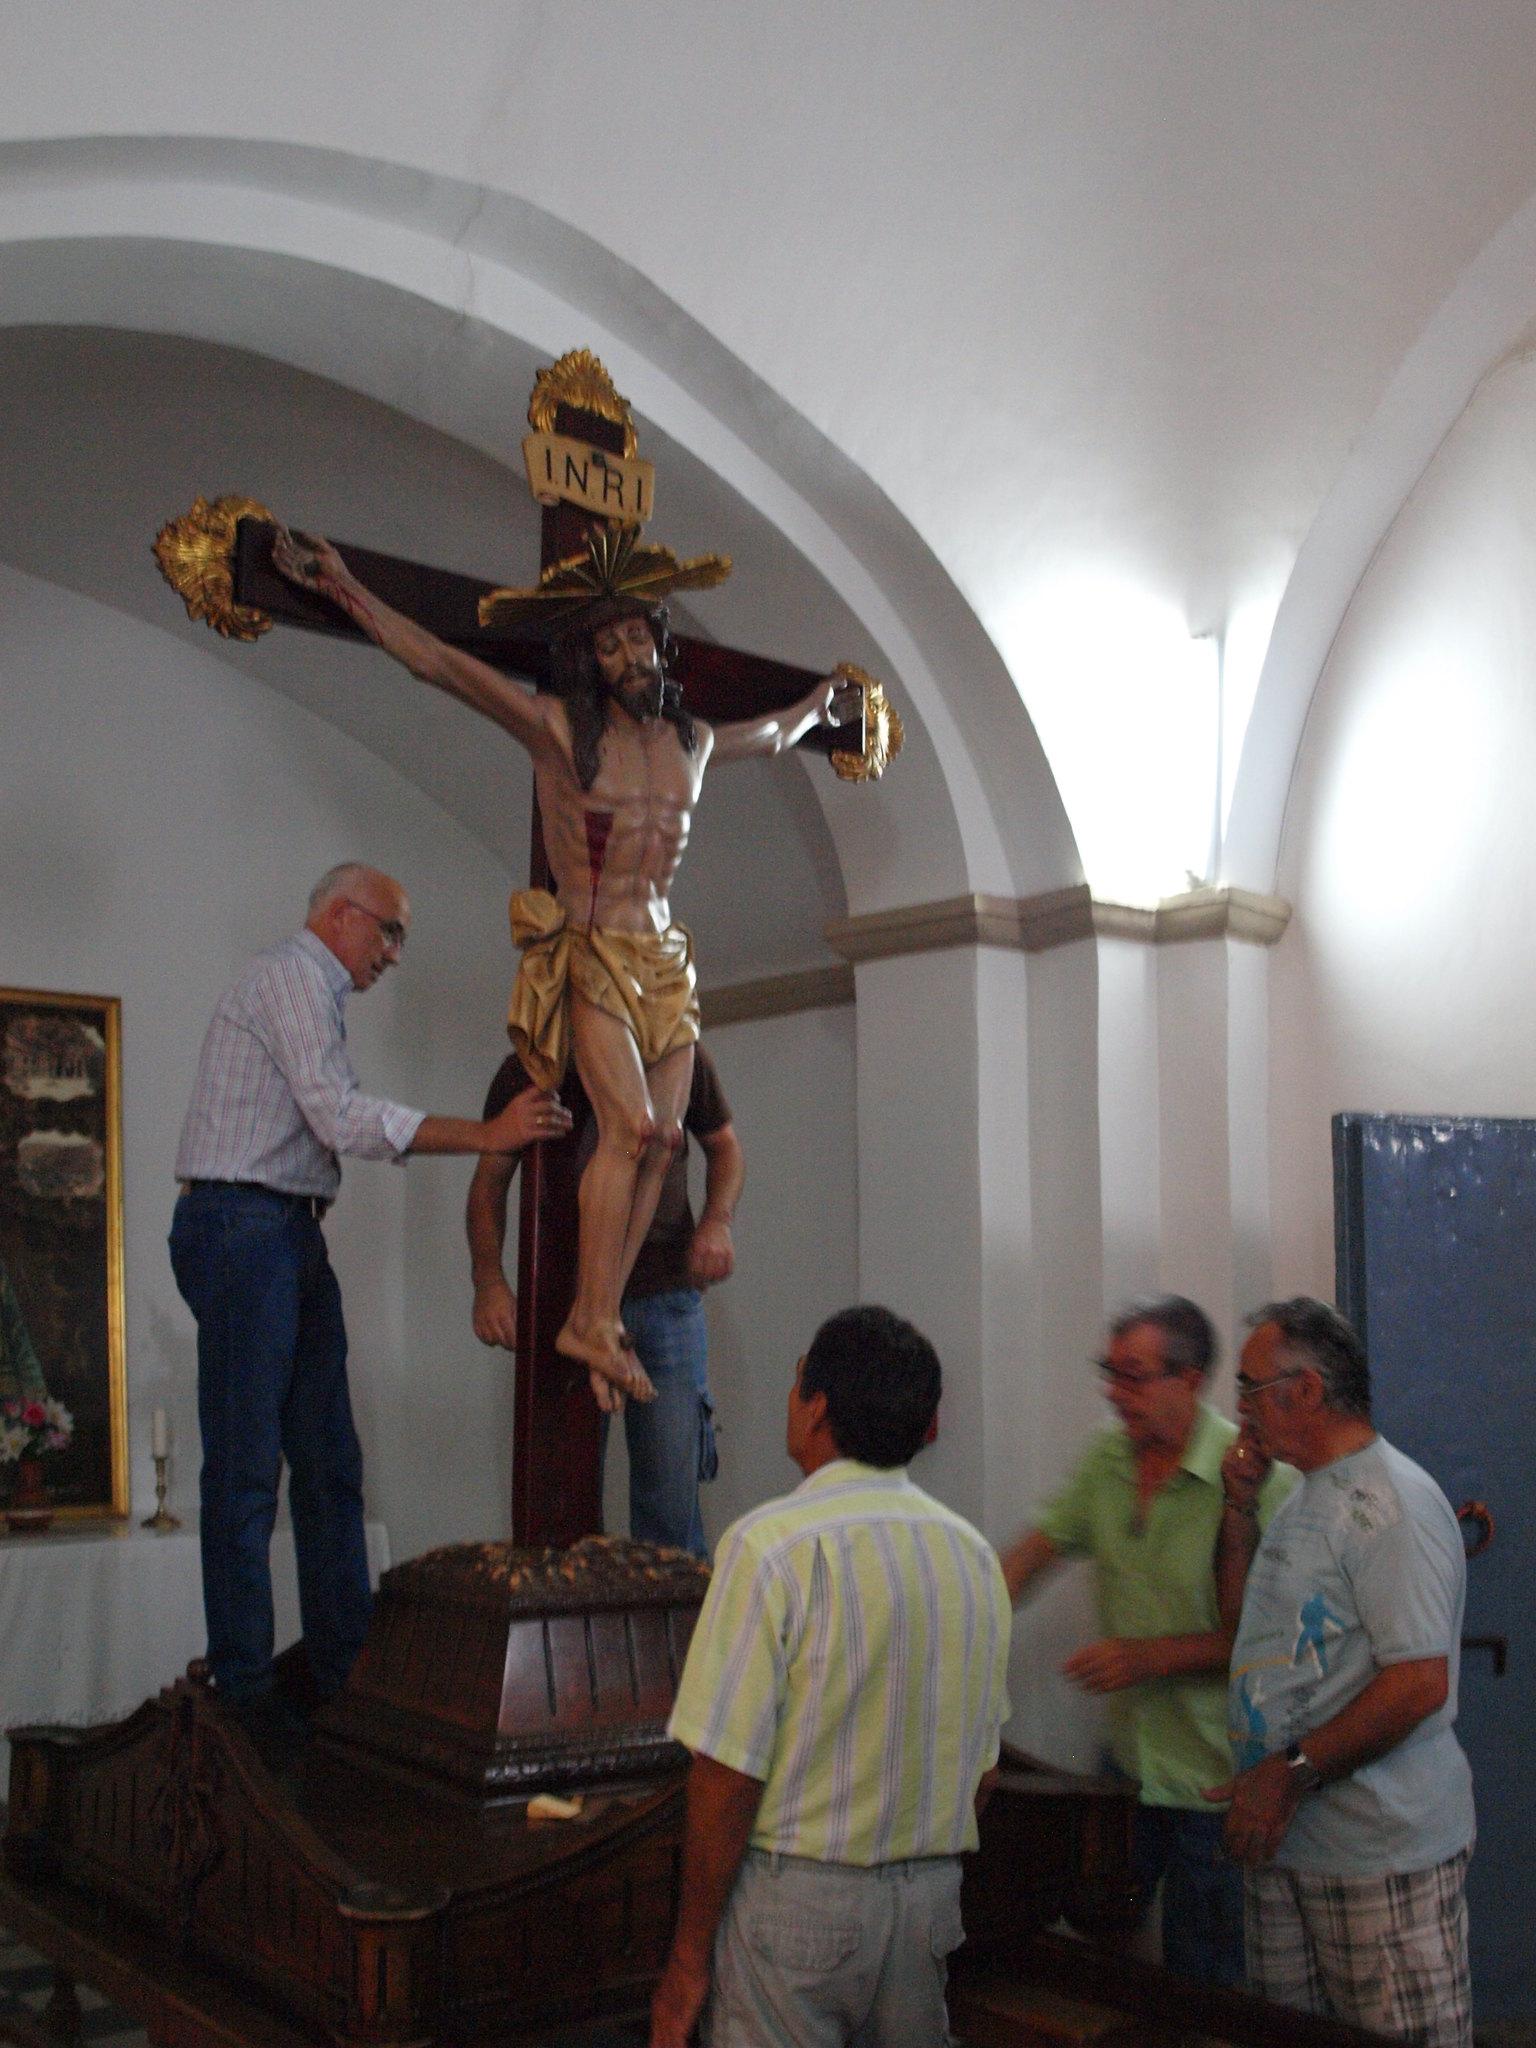 (2014-07-07) - Recogida de Imagen - Paloma Romero Torralba (25)